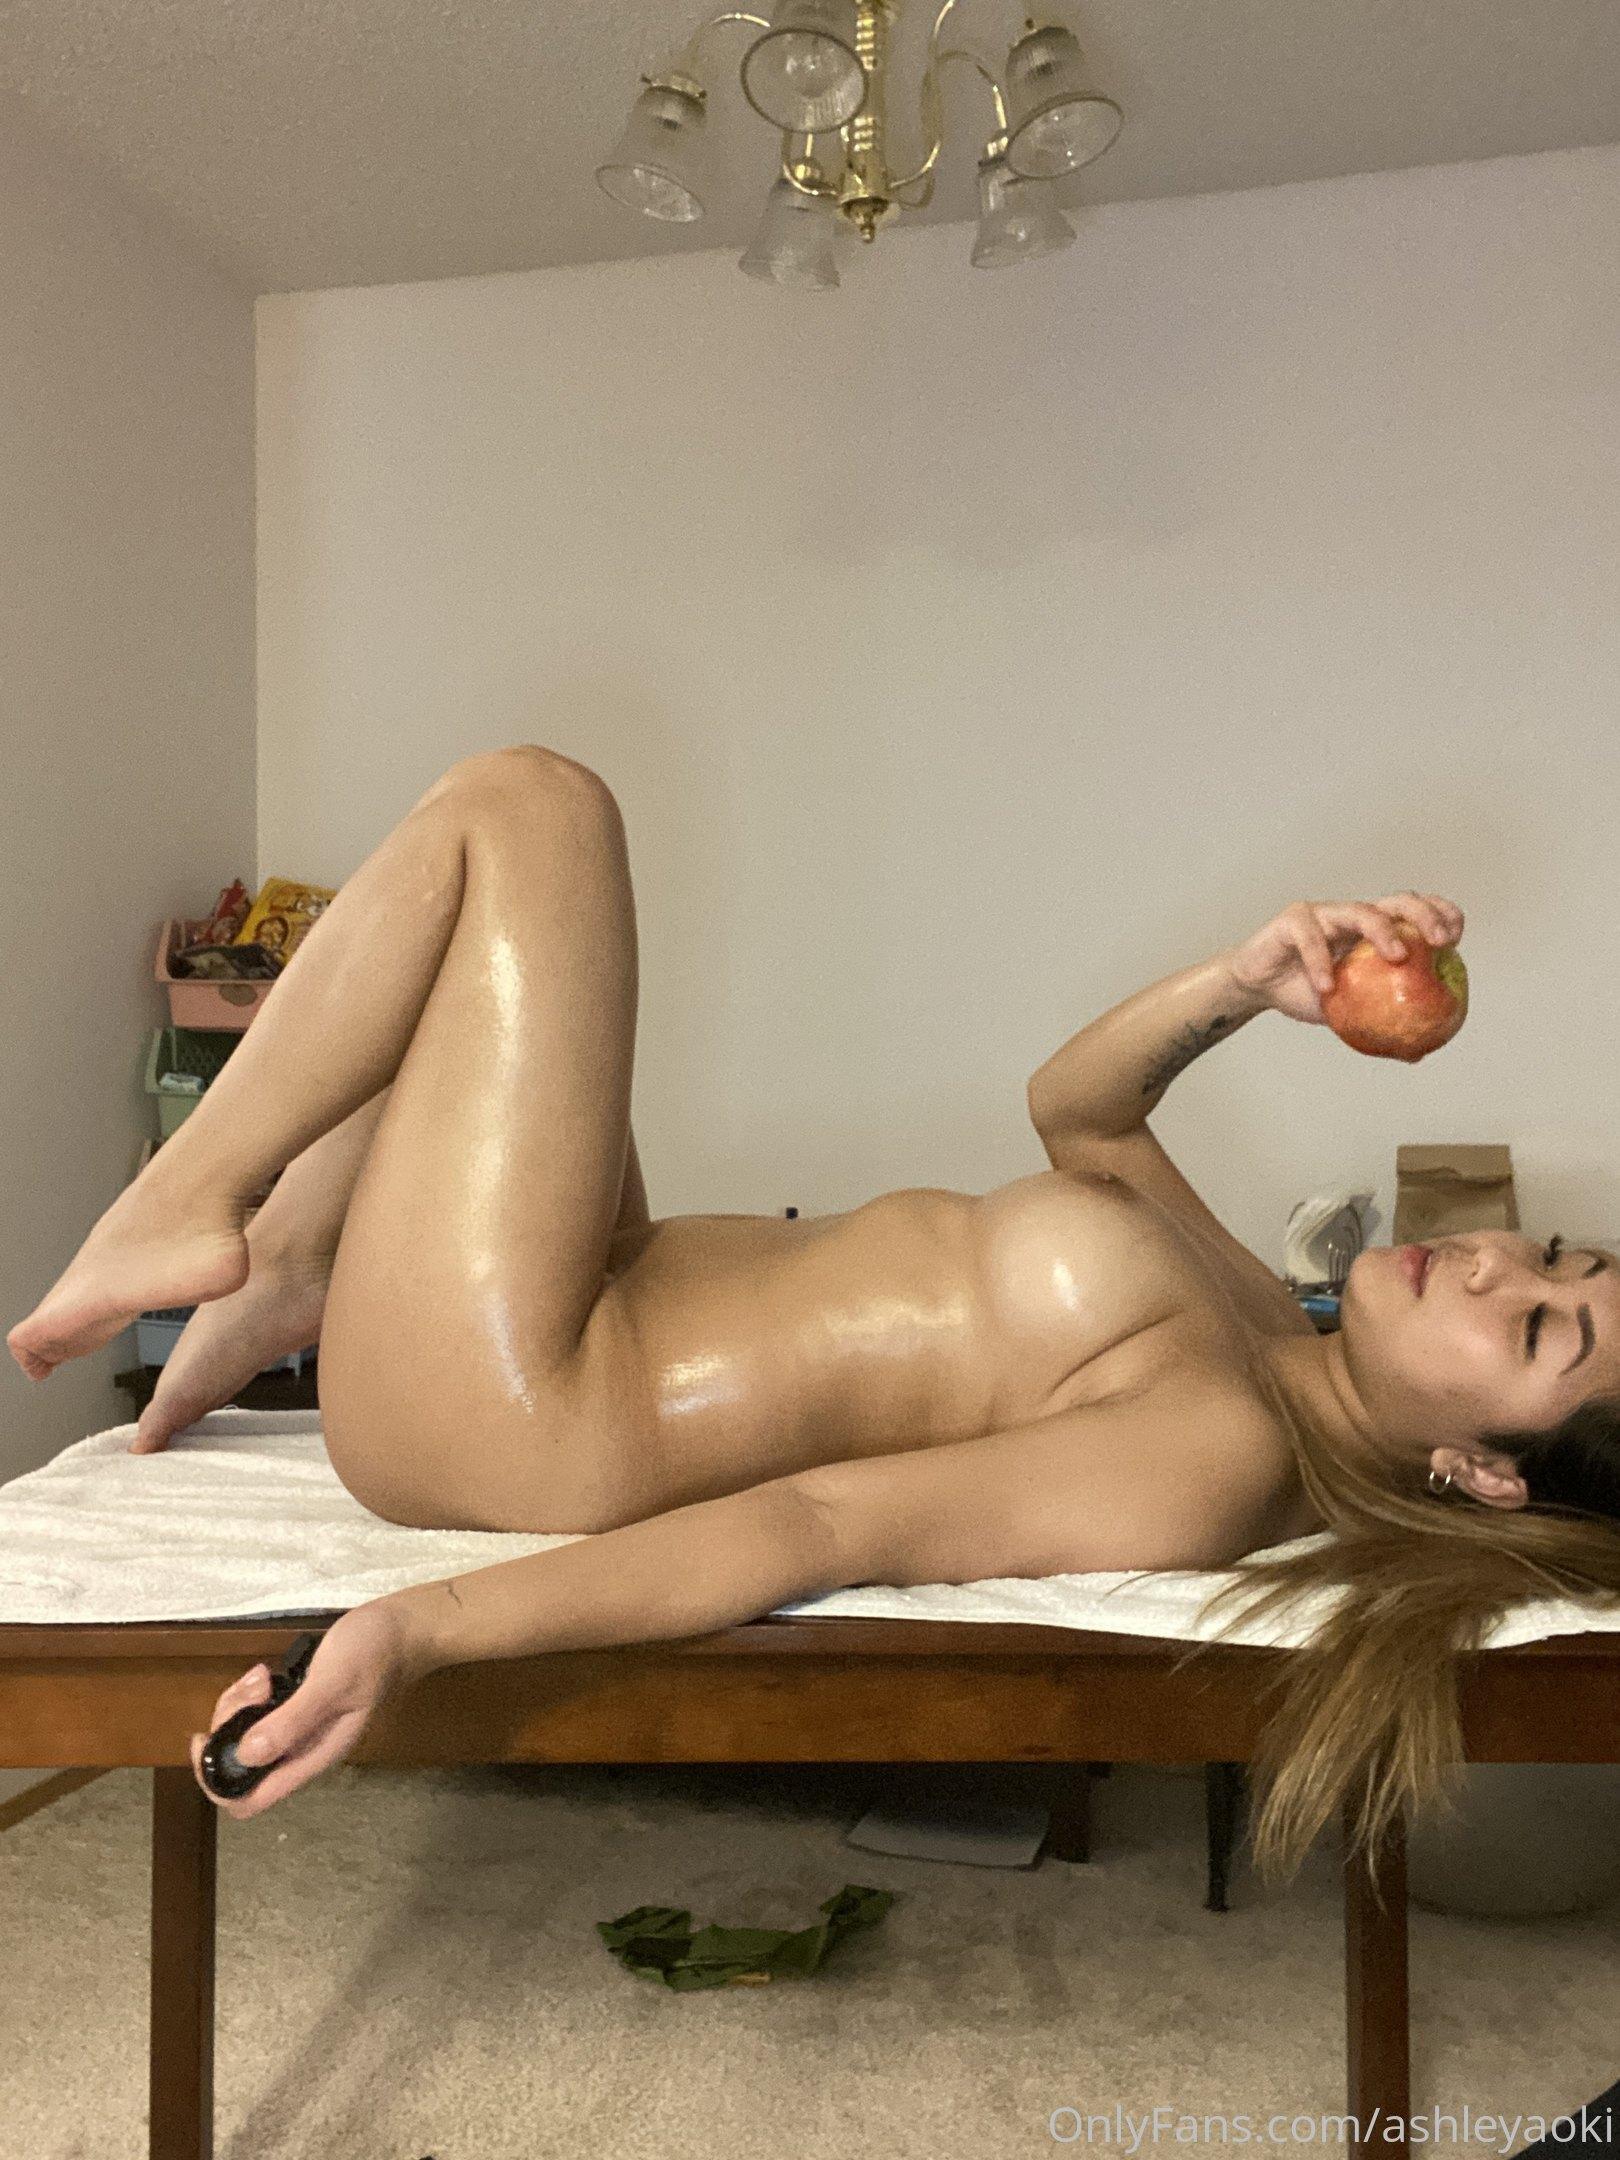 Ashley Aoki, Ashleyaoki, Onlyfans Leaks 0226